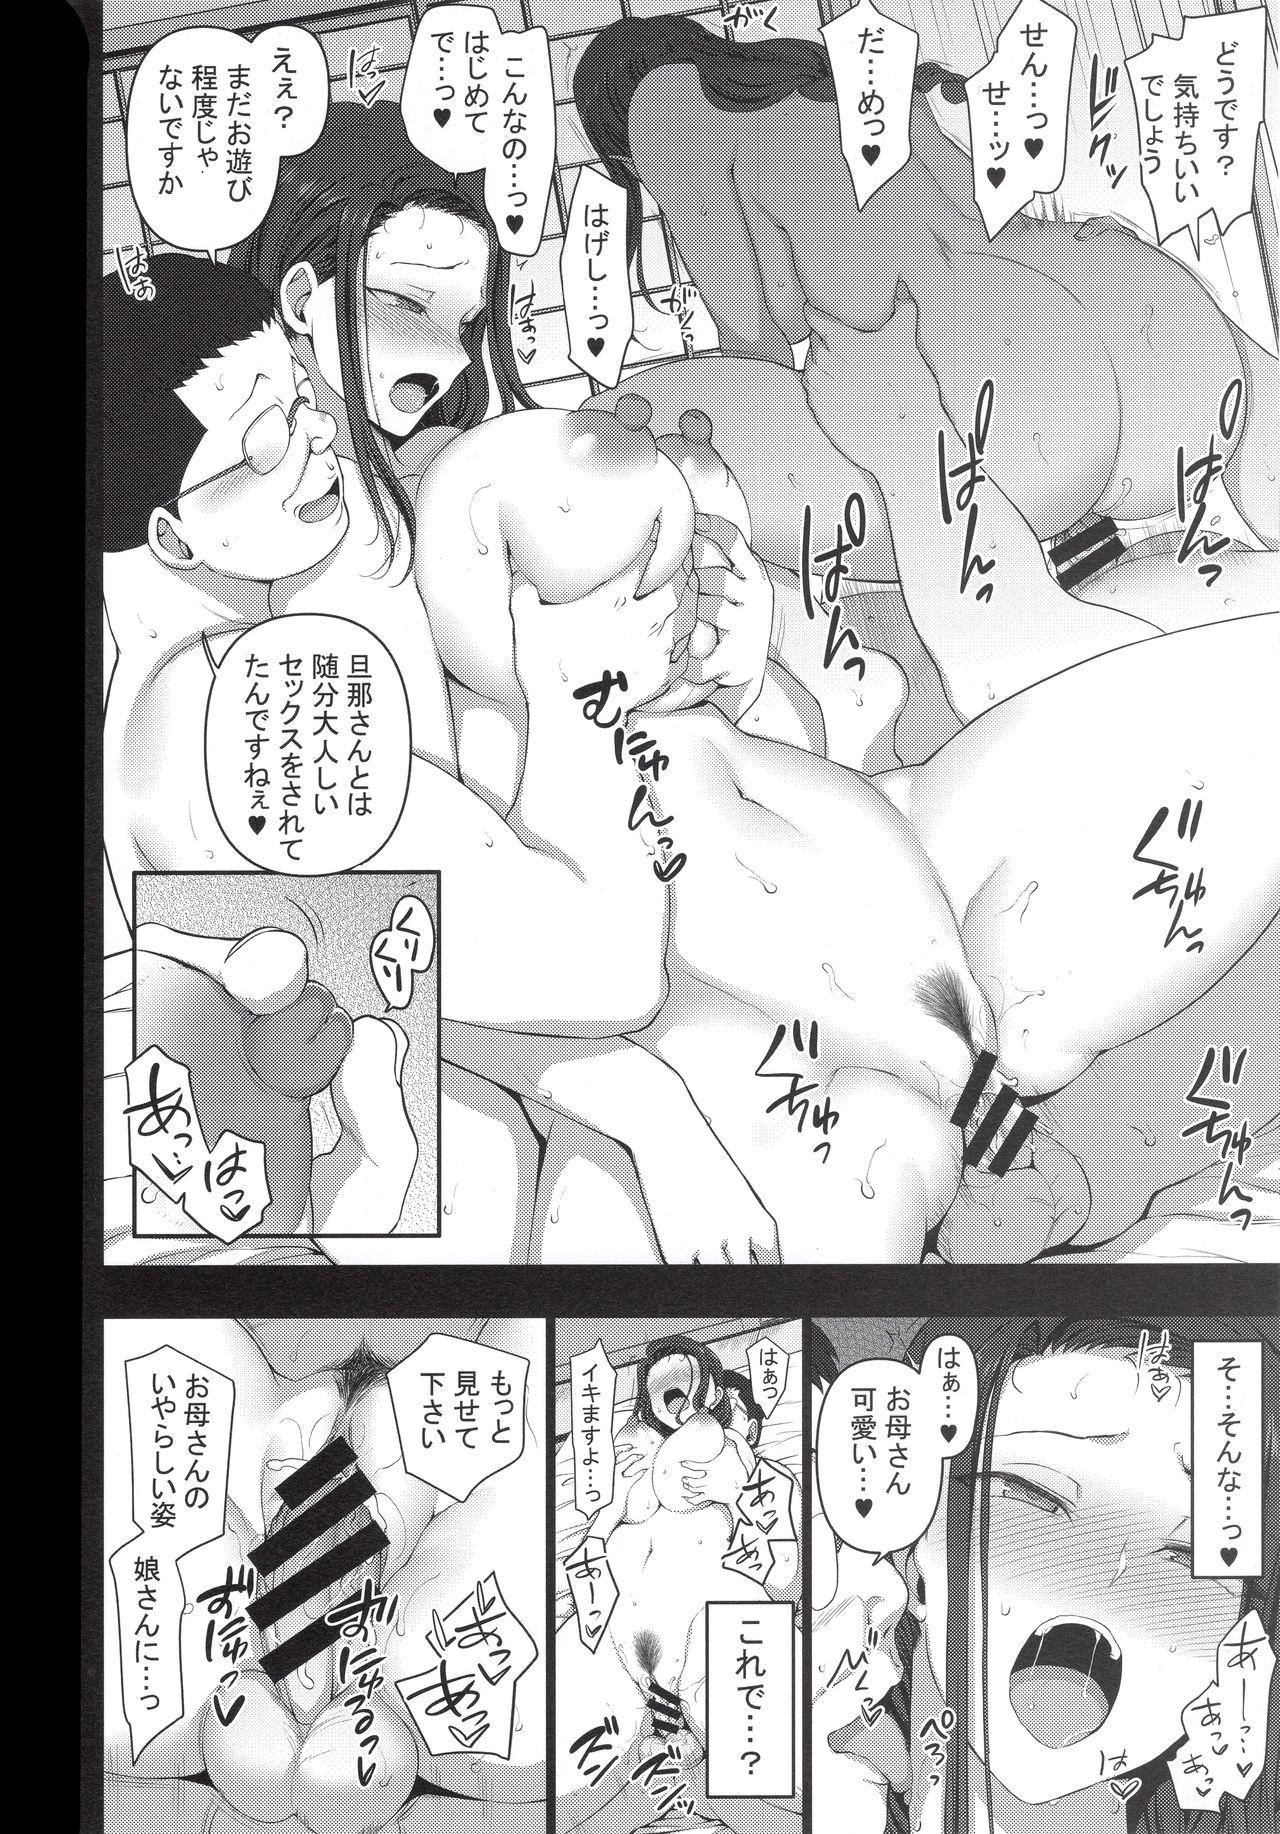 Saimin Seishidou 4: Ninshin Taiken Shidou 58